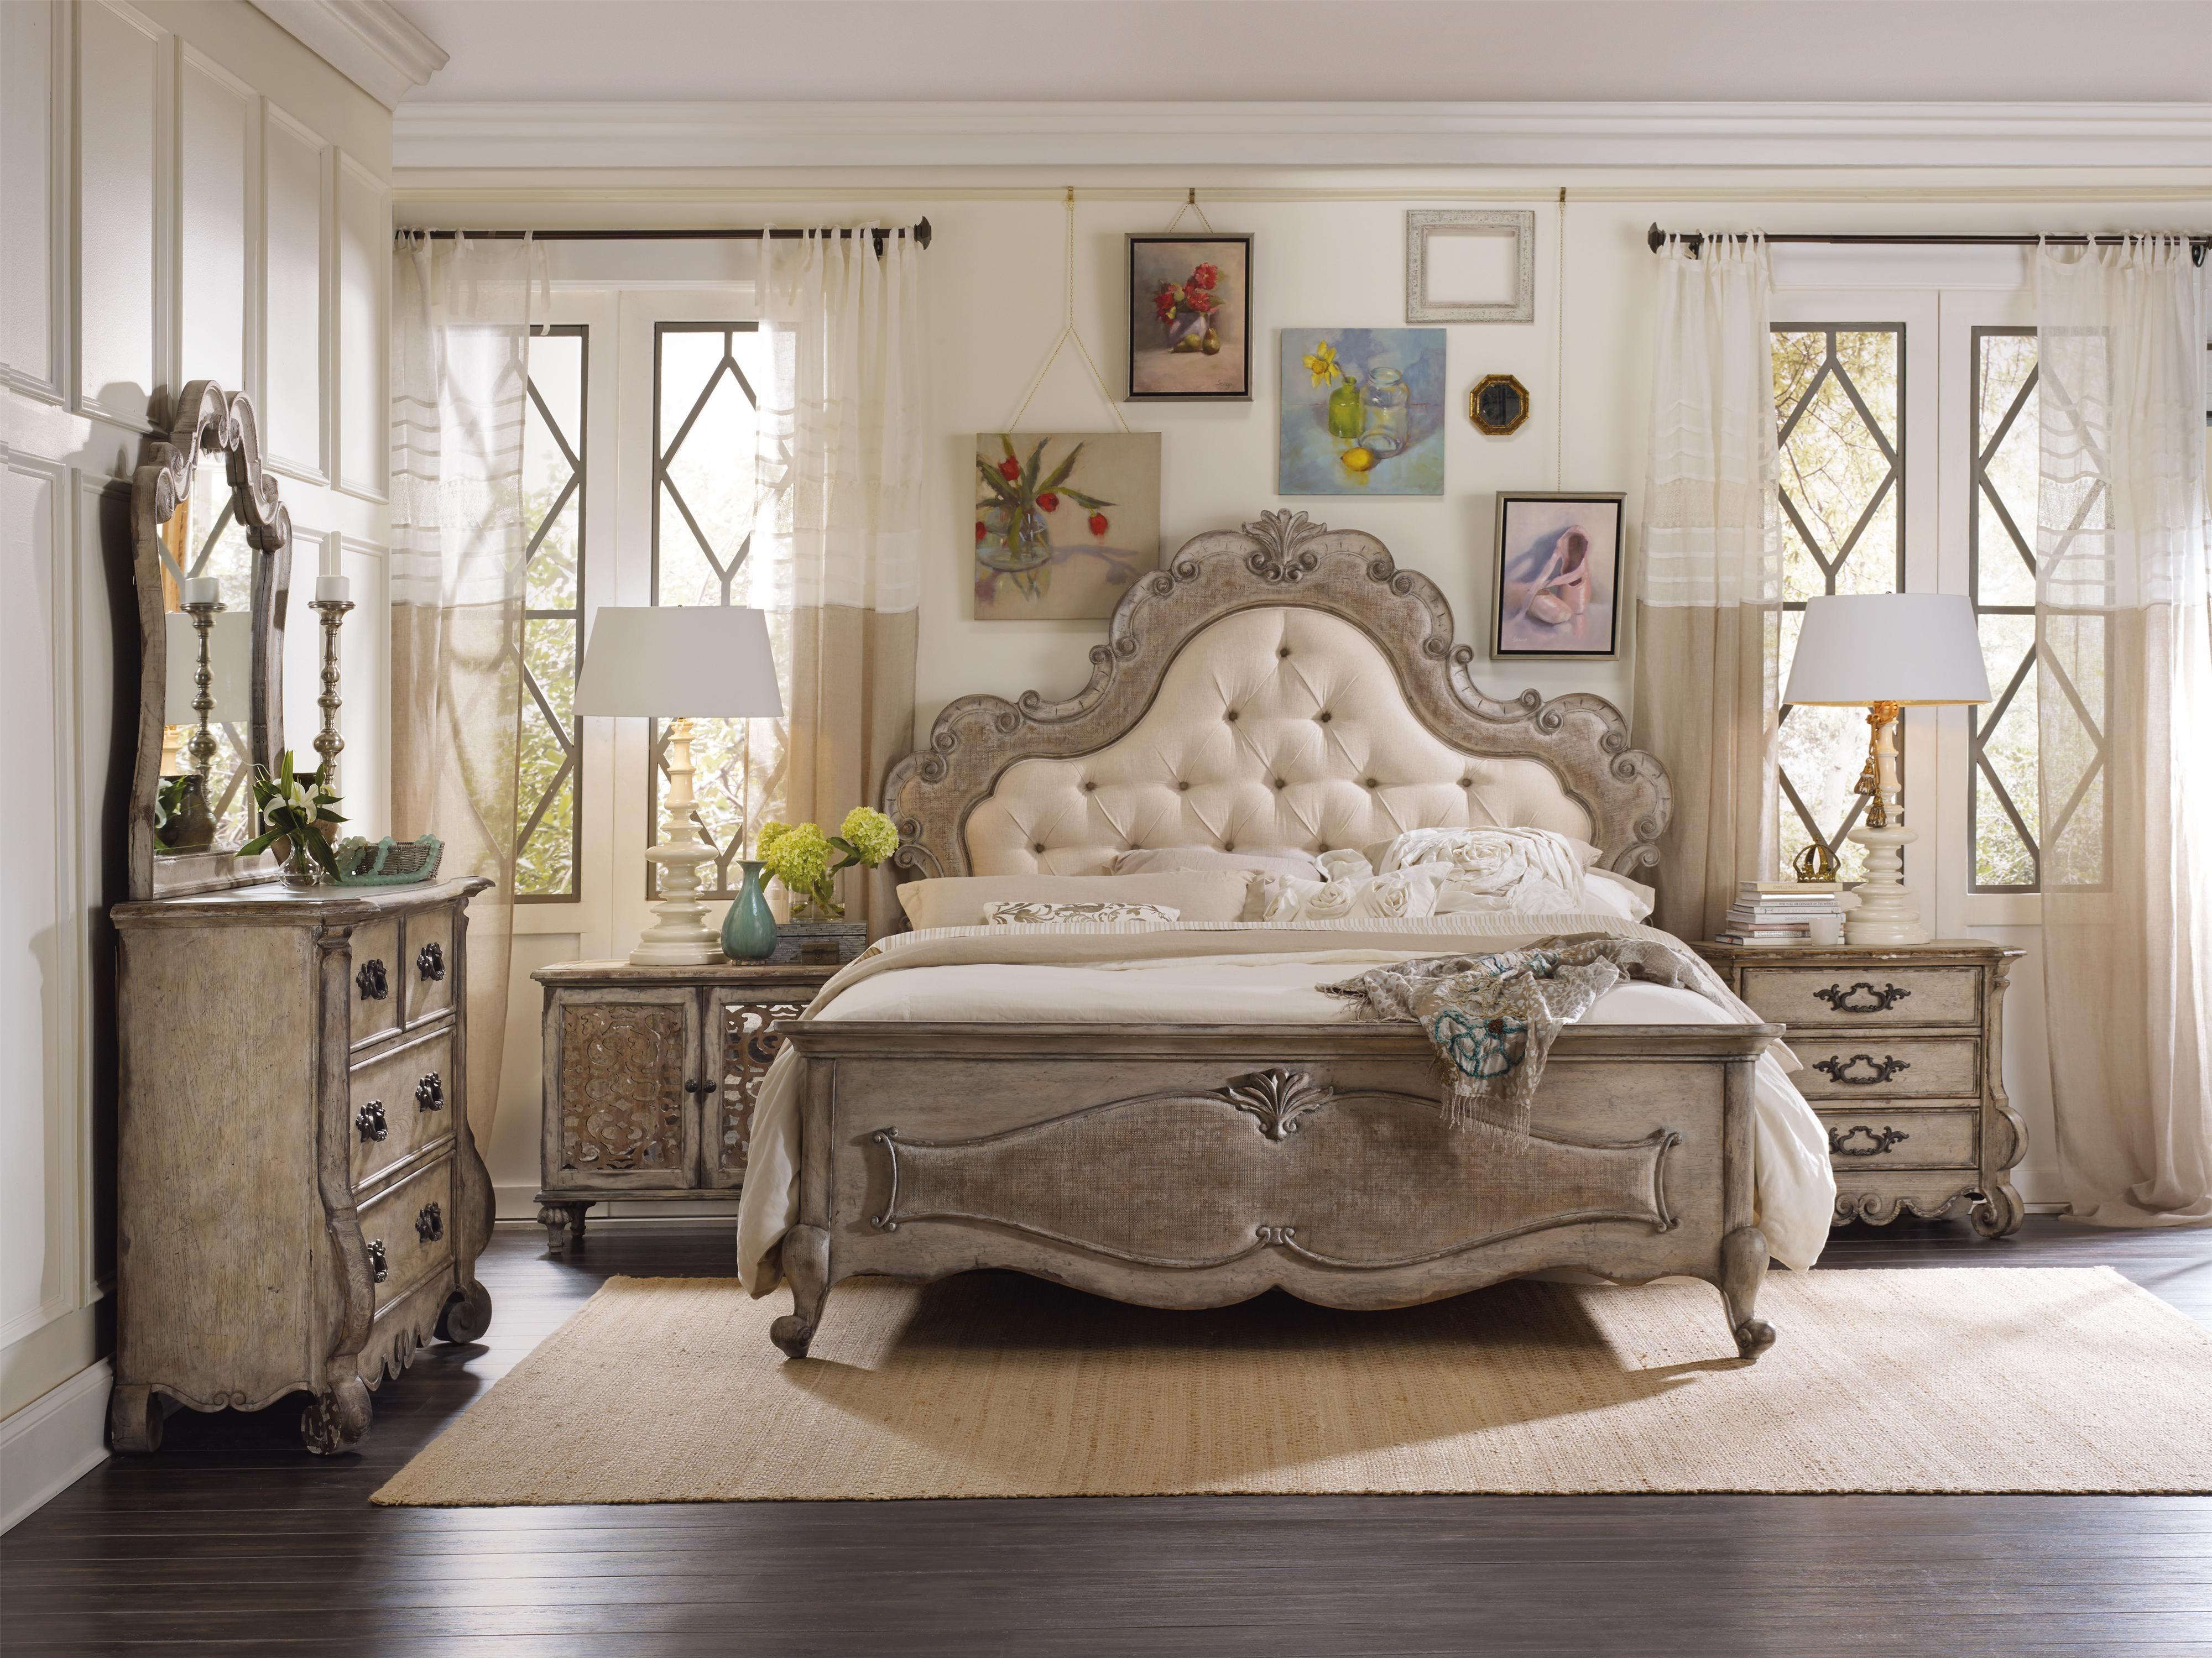 Merveilleux Lagniappe Home Store | Mobile, Daphne, Alabama Furniture U0026 Mattress ...